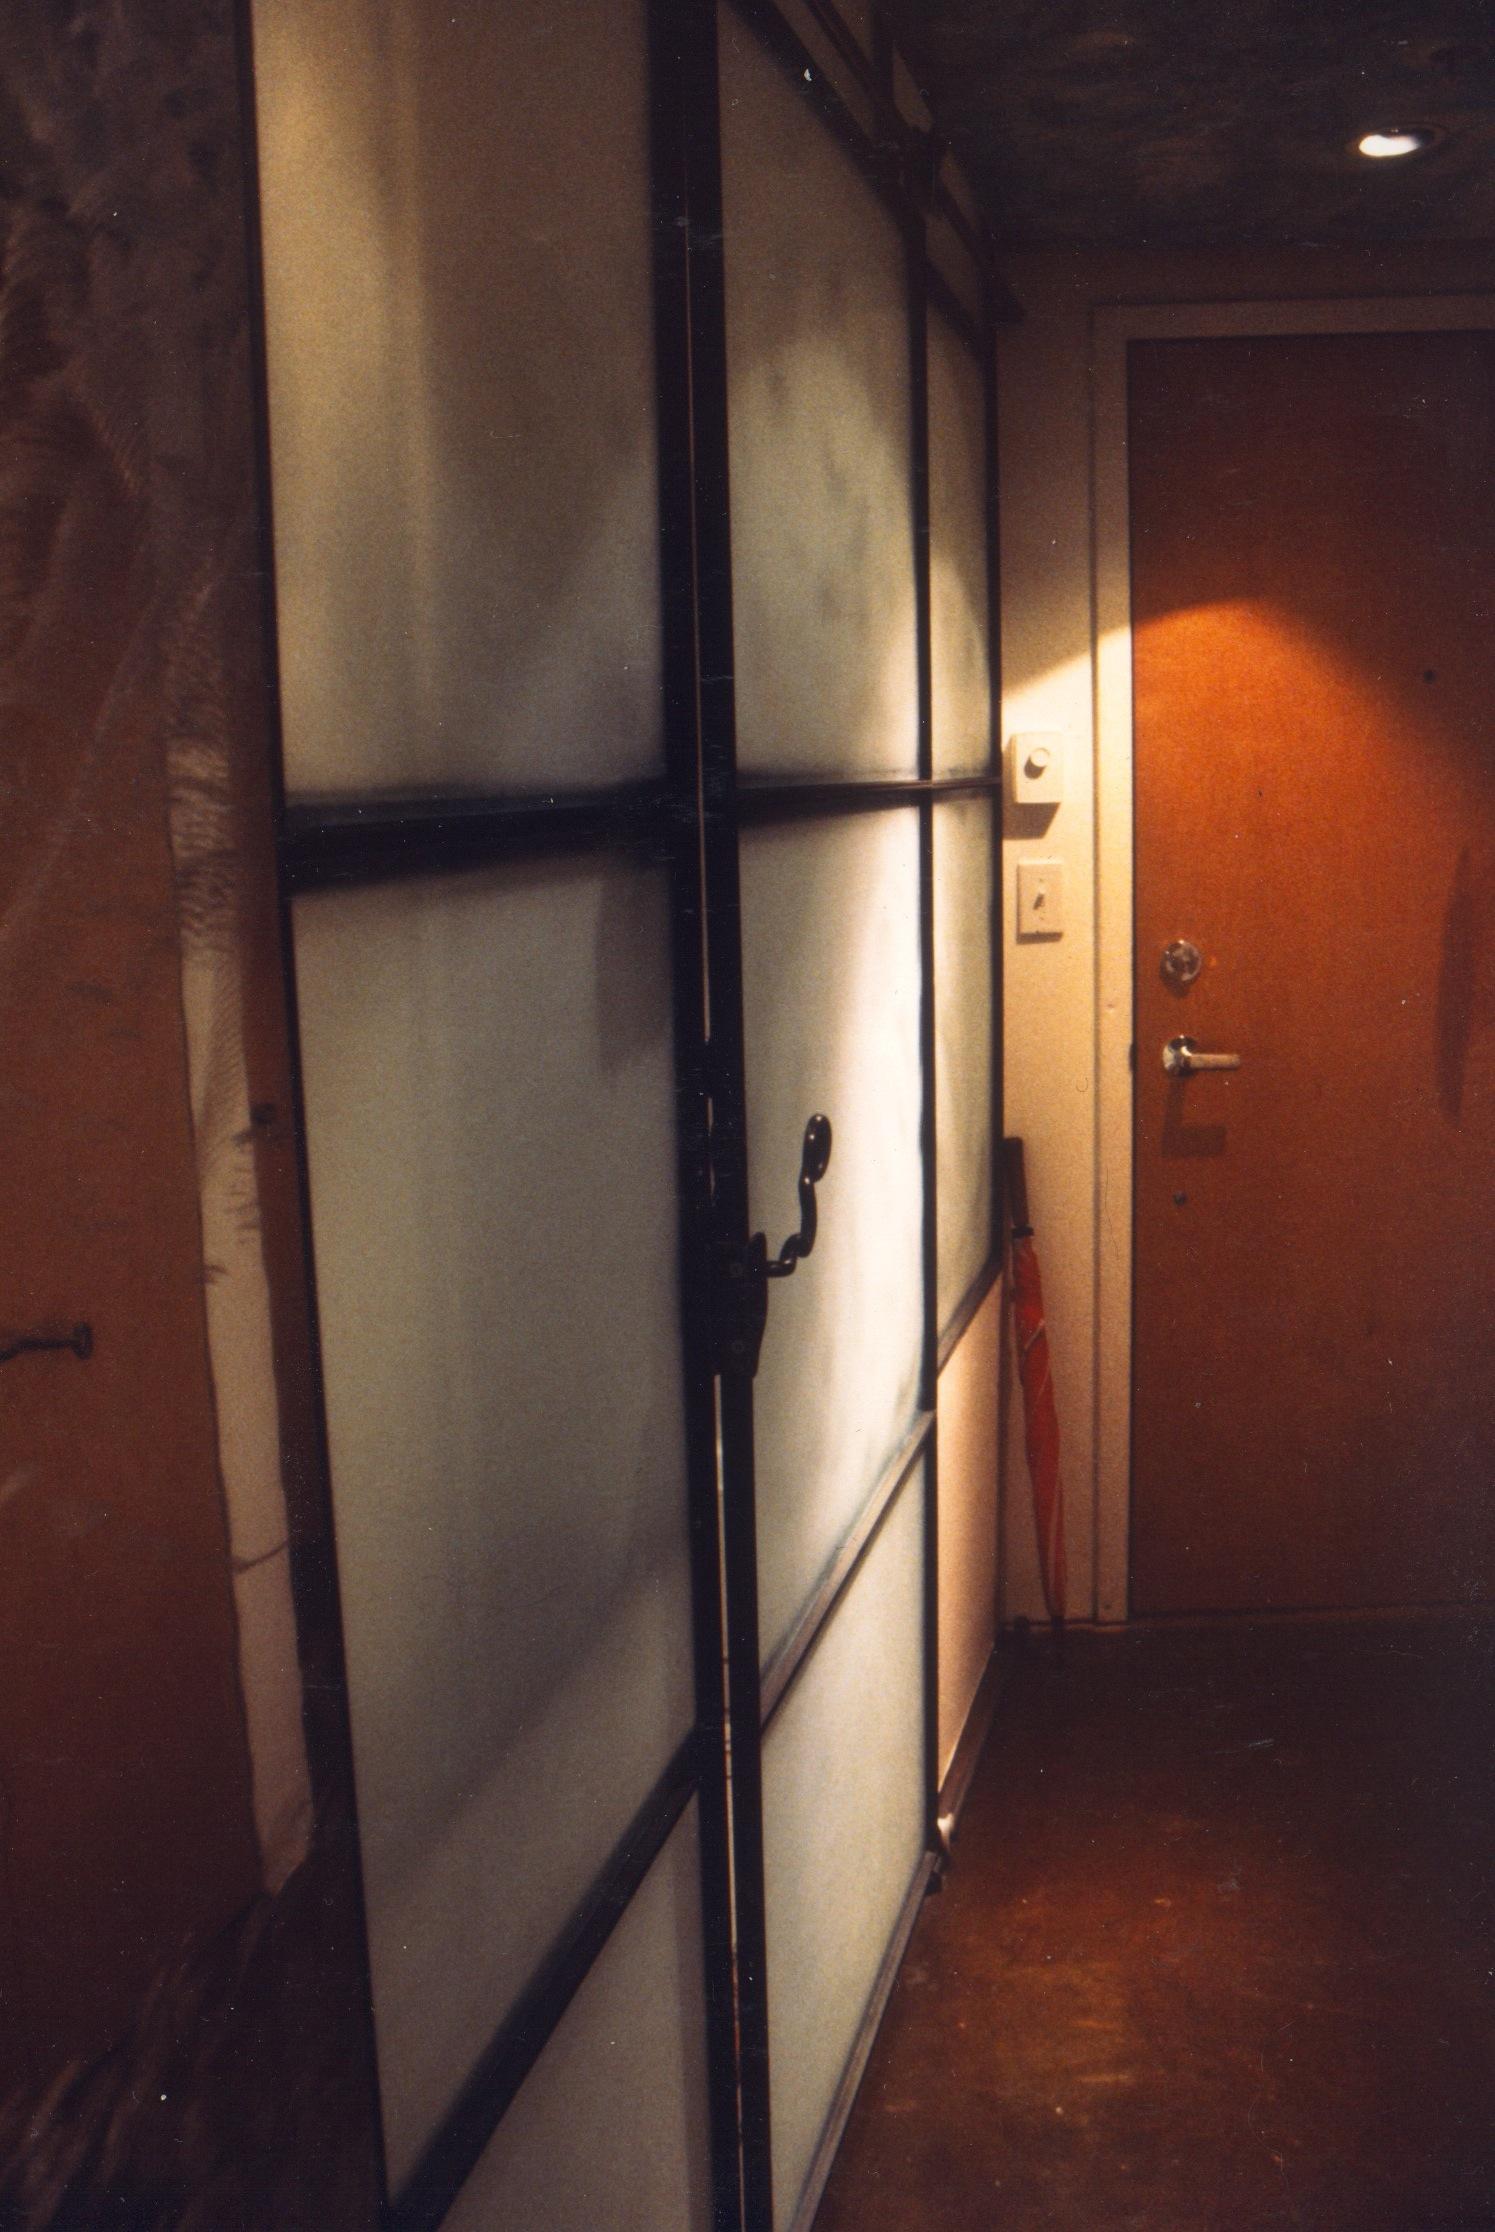 Bathroom Shoji Screen Wall @ Hallway - Sandblasted Glass + Steel Sliding Elements